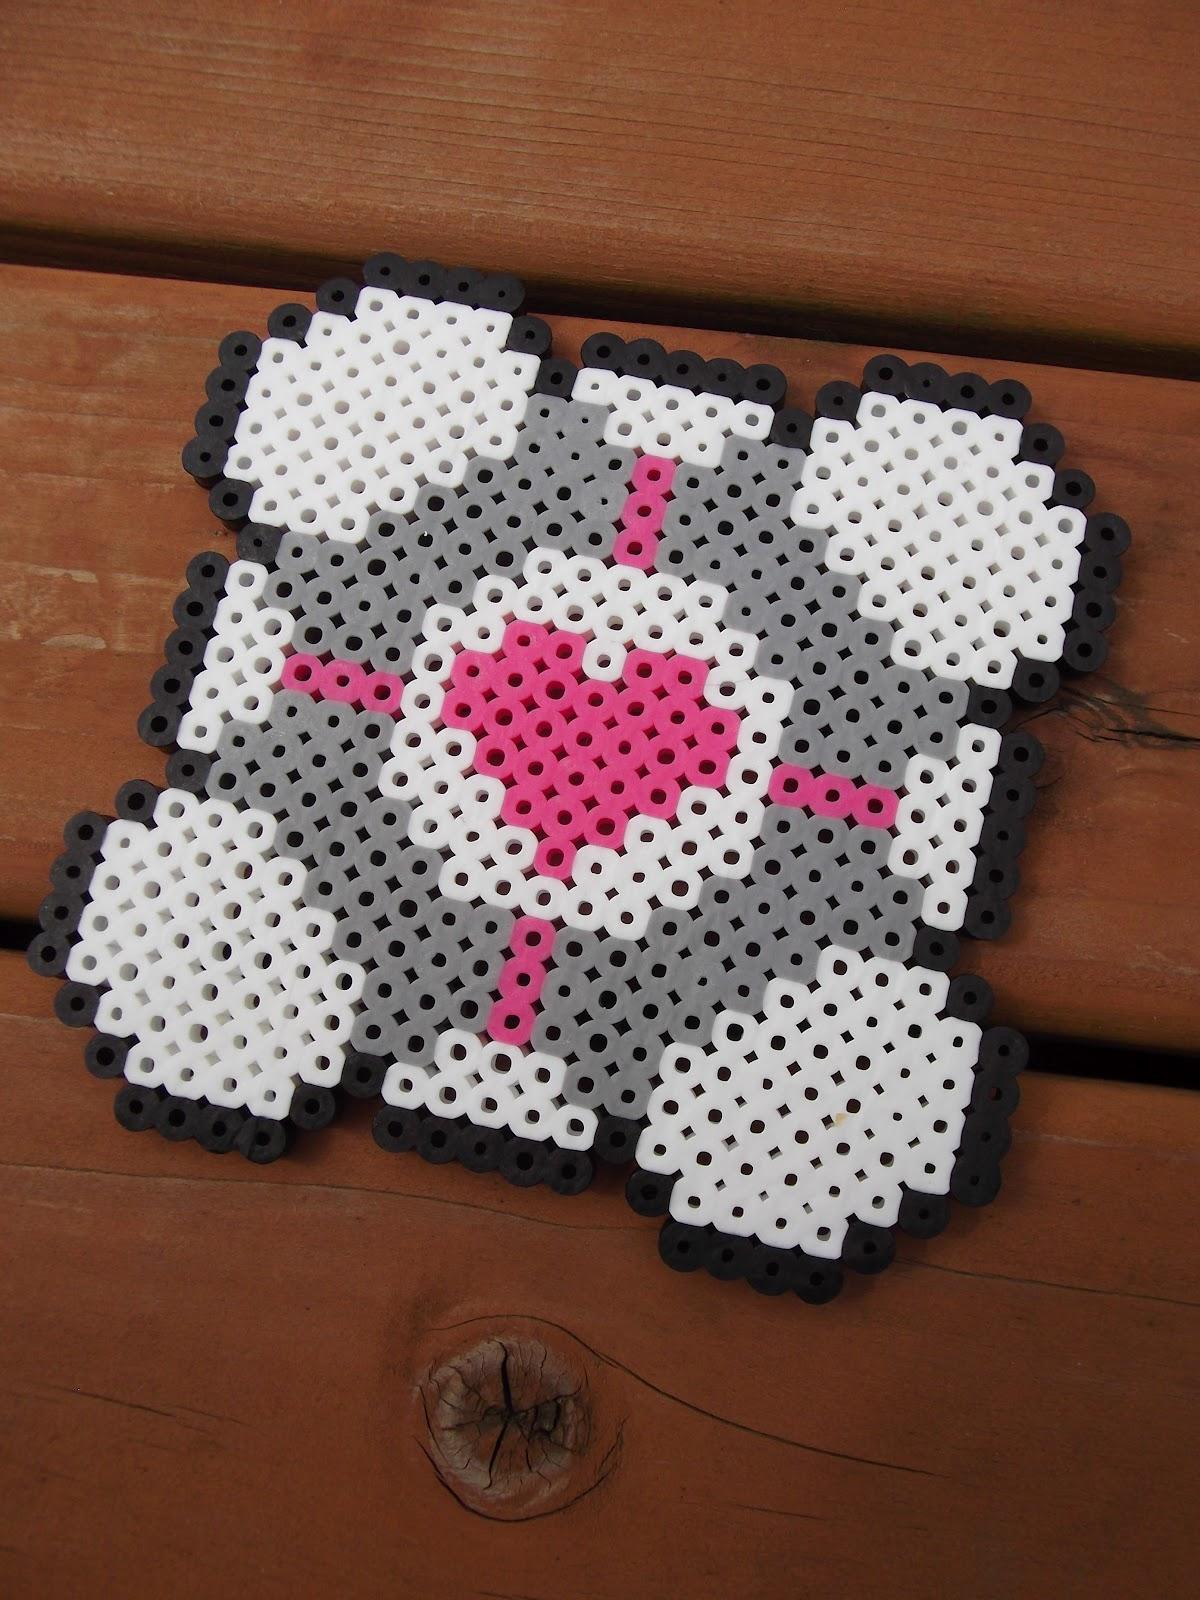 Mule 39 n nag crafts perler bead sprites - Hama beads cuadros ...